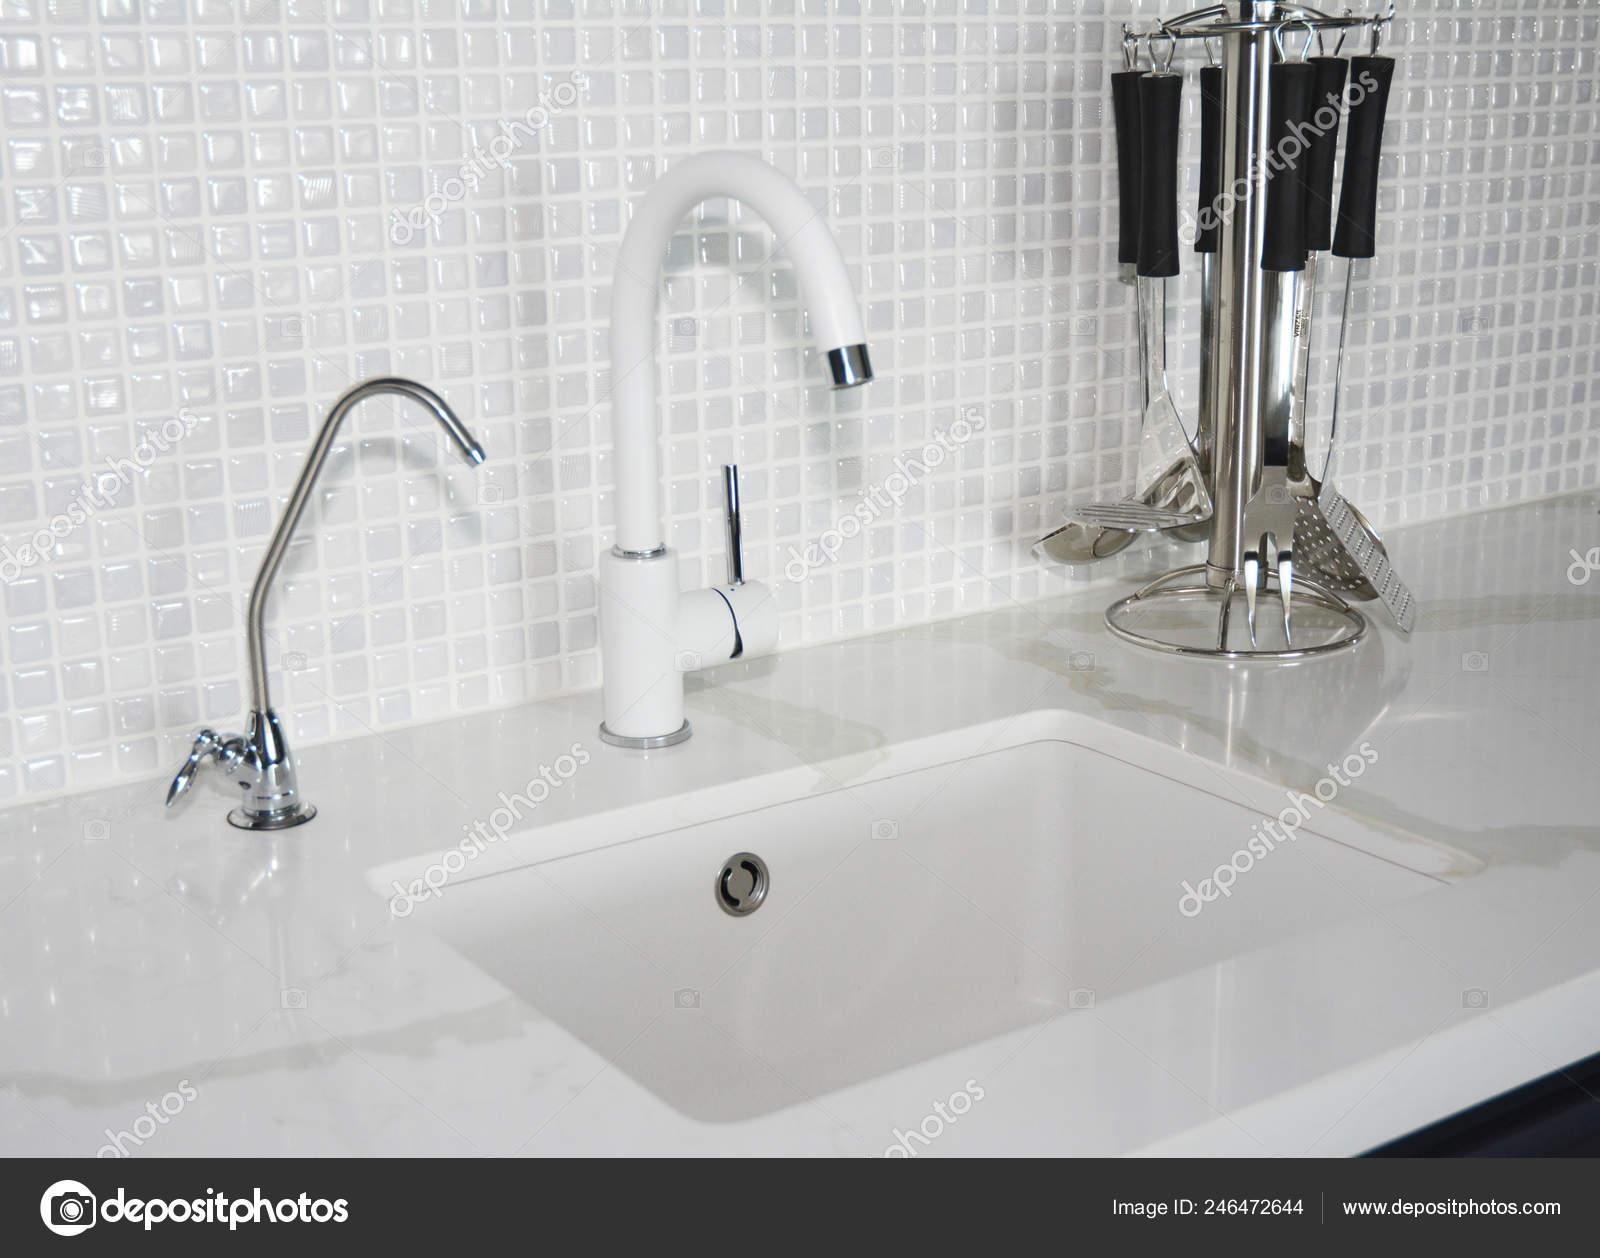 Modern Ceramic Kitchen Sink Modern Kitchen Chrome Faucet Mosaic